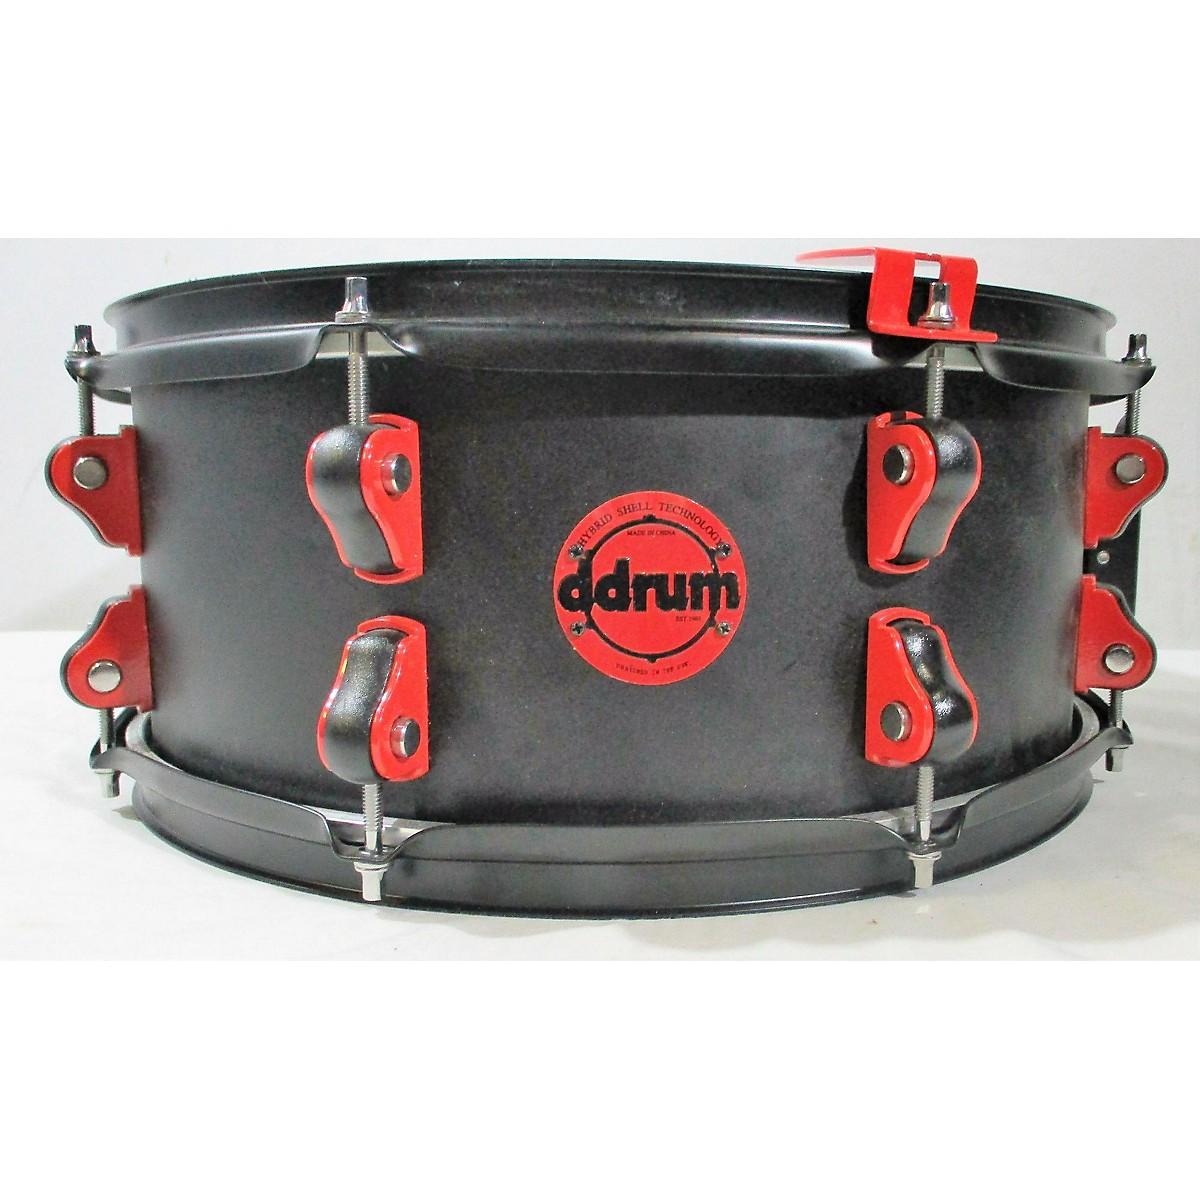 ddrum 14X6 Exclusive Hybrid Drum